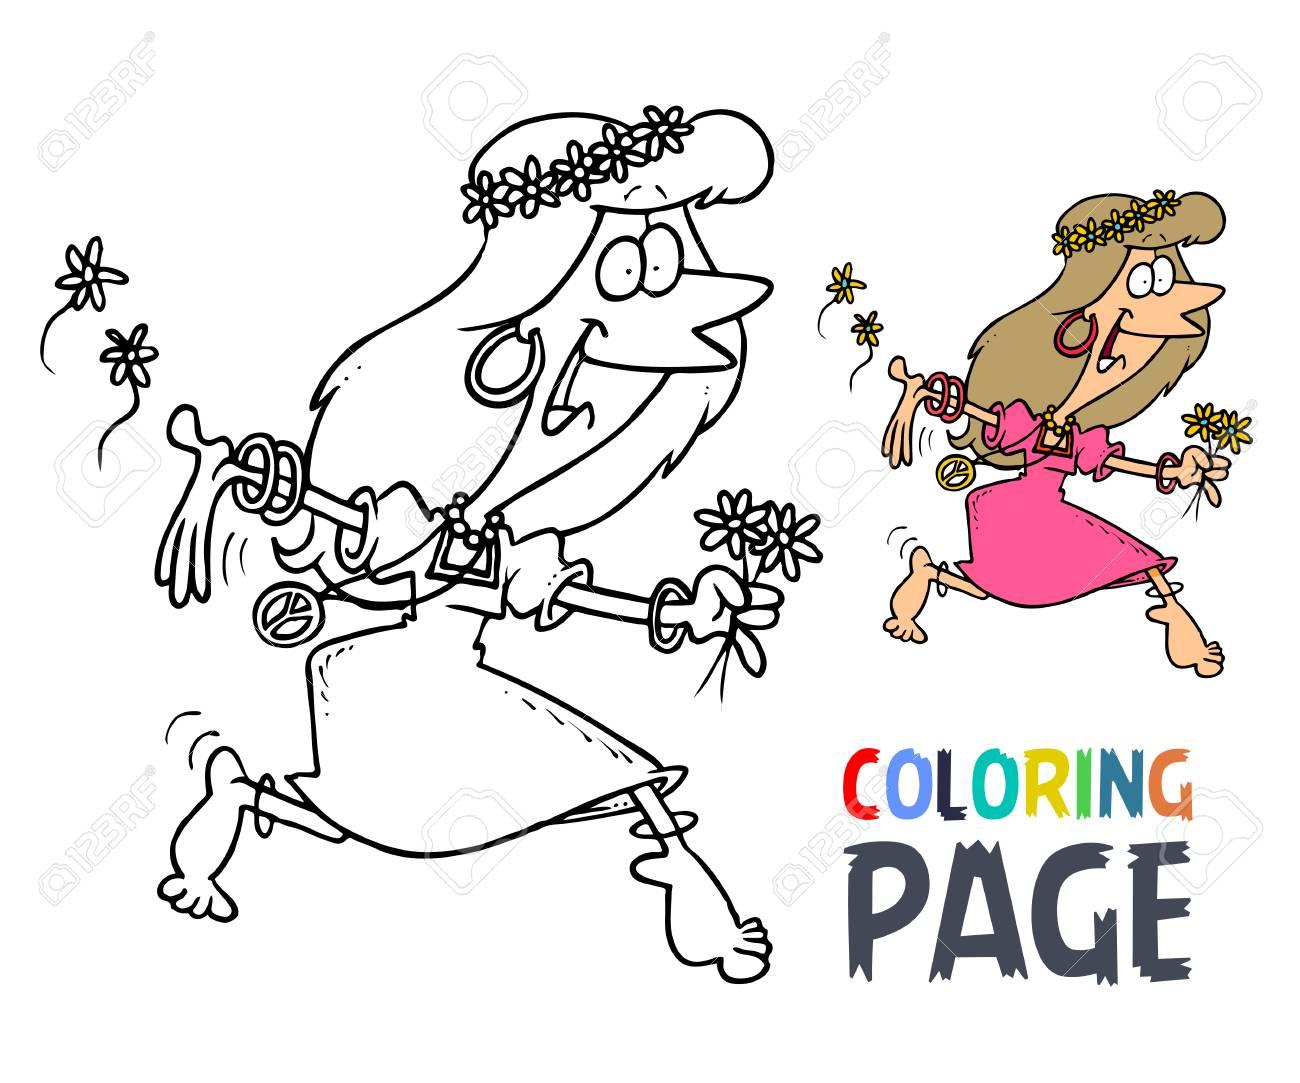 Women Dancing Cartoon Coloring Page Royalty Free Cliparts Vectors